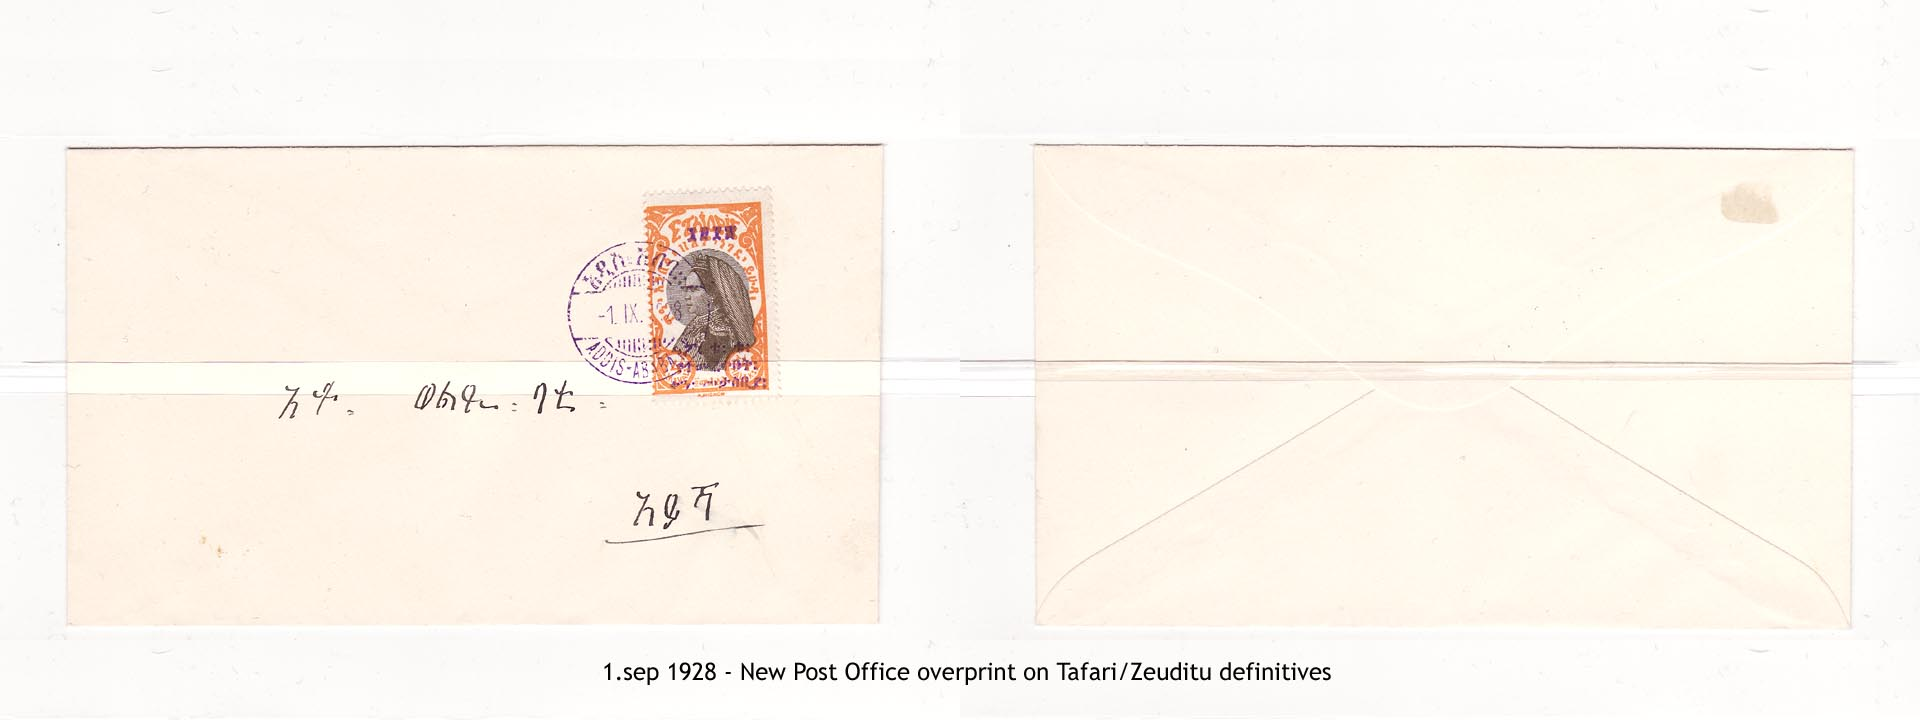 19280901 - New Post Office overprint on Tafari-Zeuditu definitives